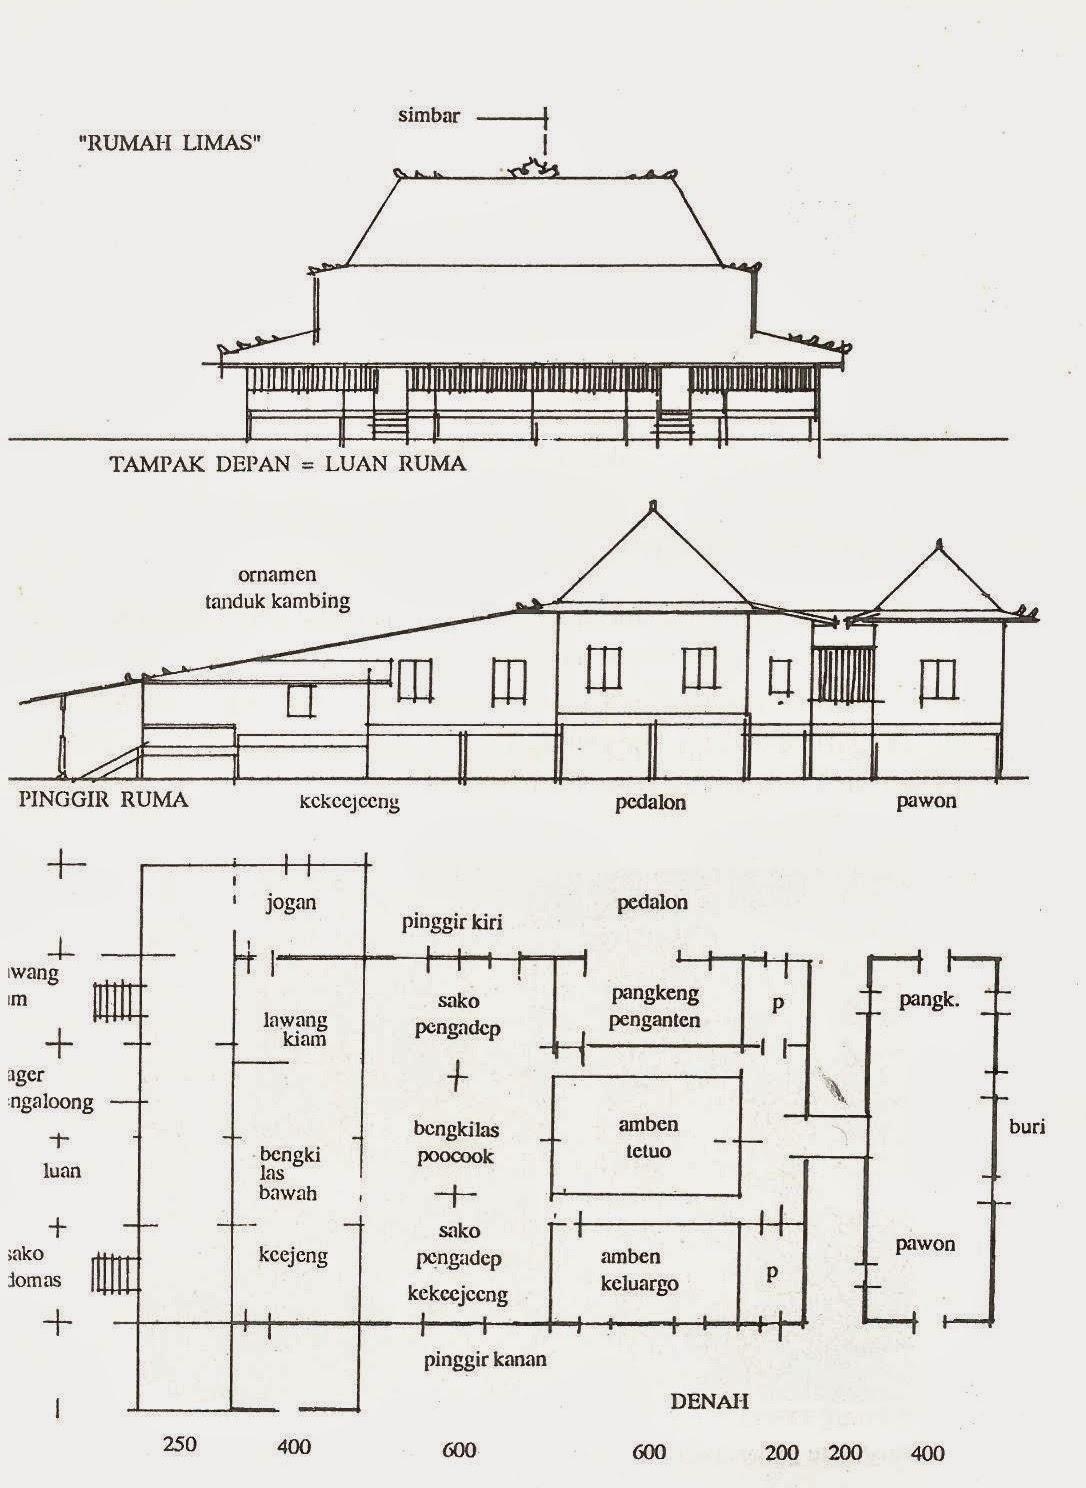 Gambar Rumah Limas : gambar, rumah, limas, Palembang, Sriwijaya:, Rumah, Tradisional, Limas